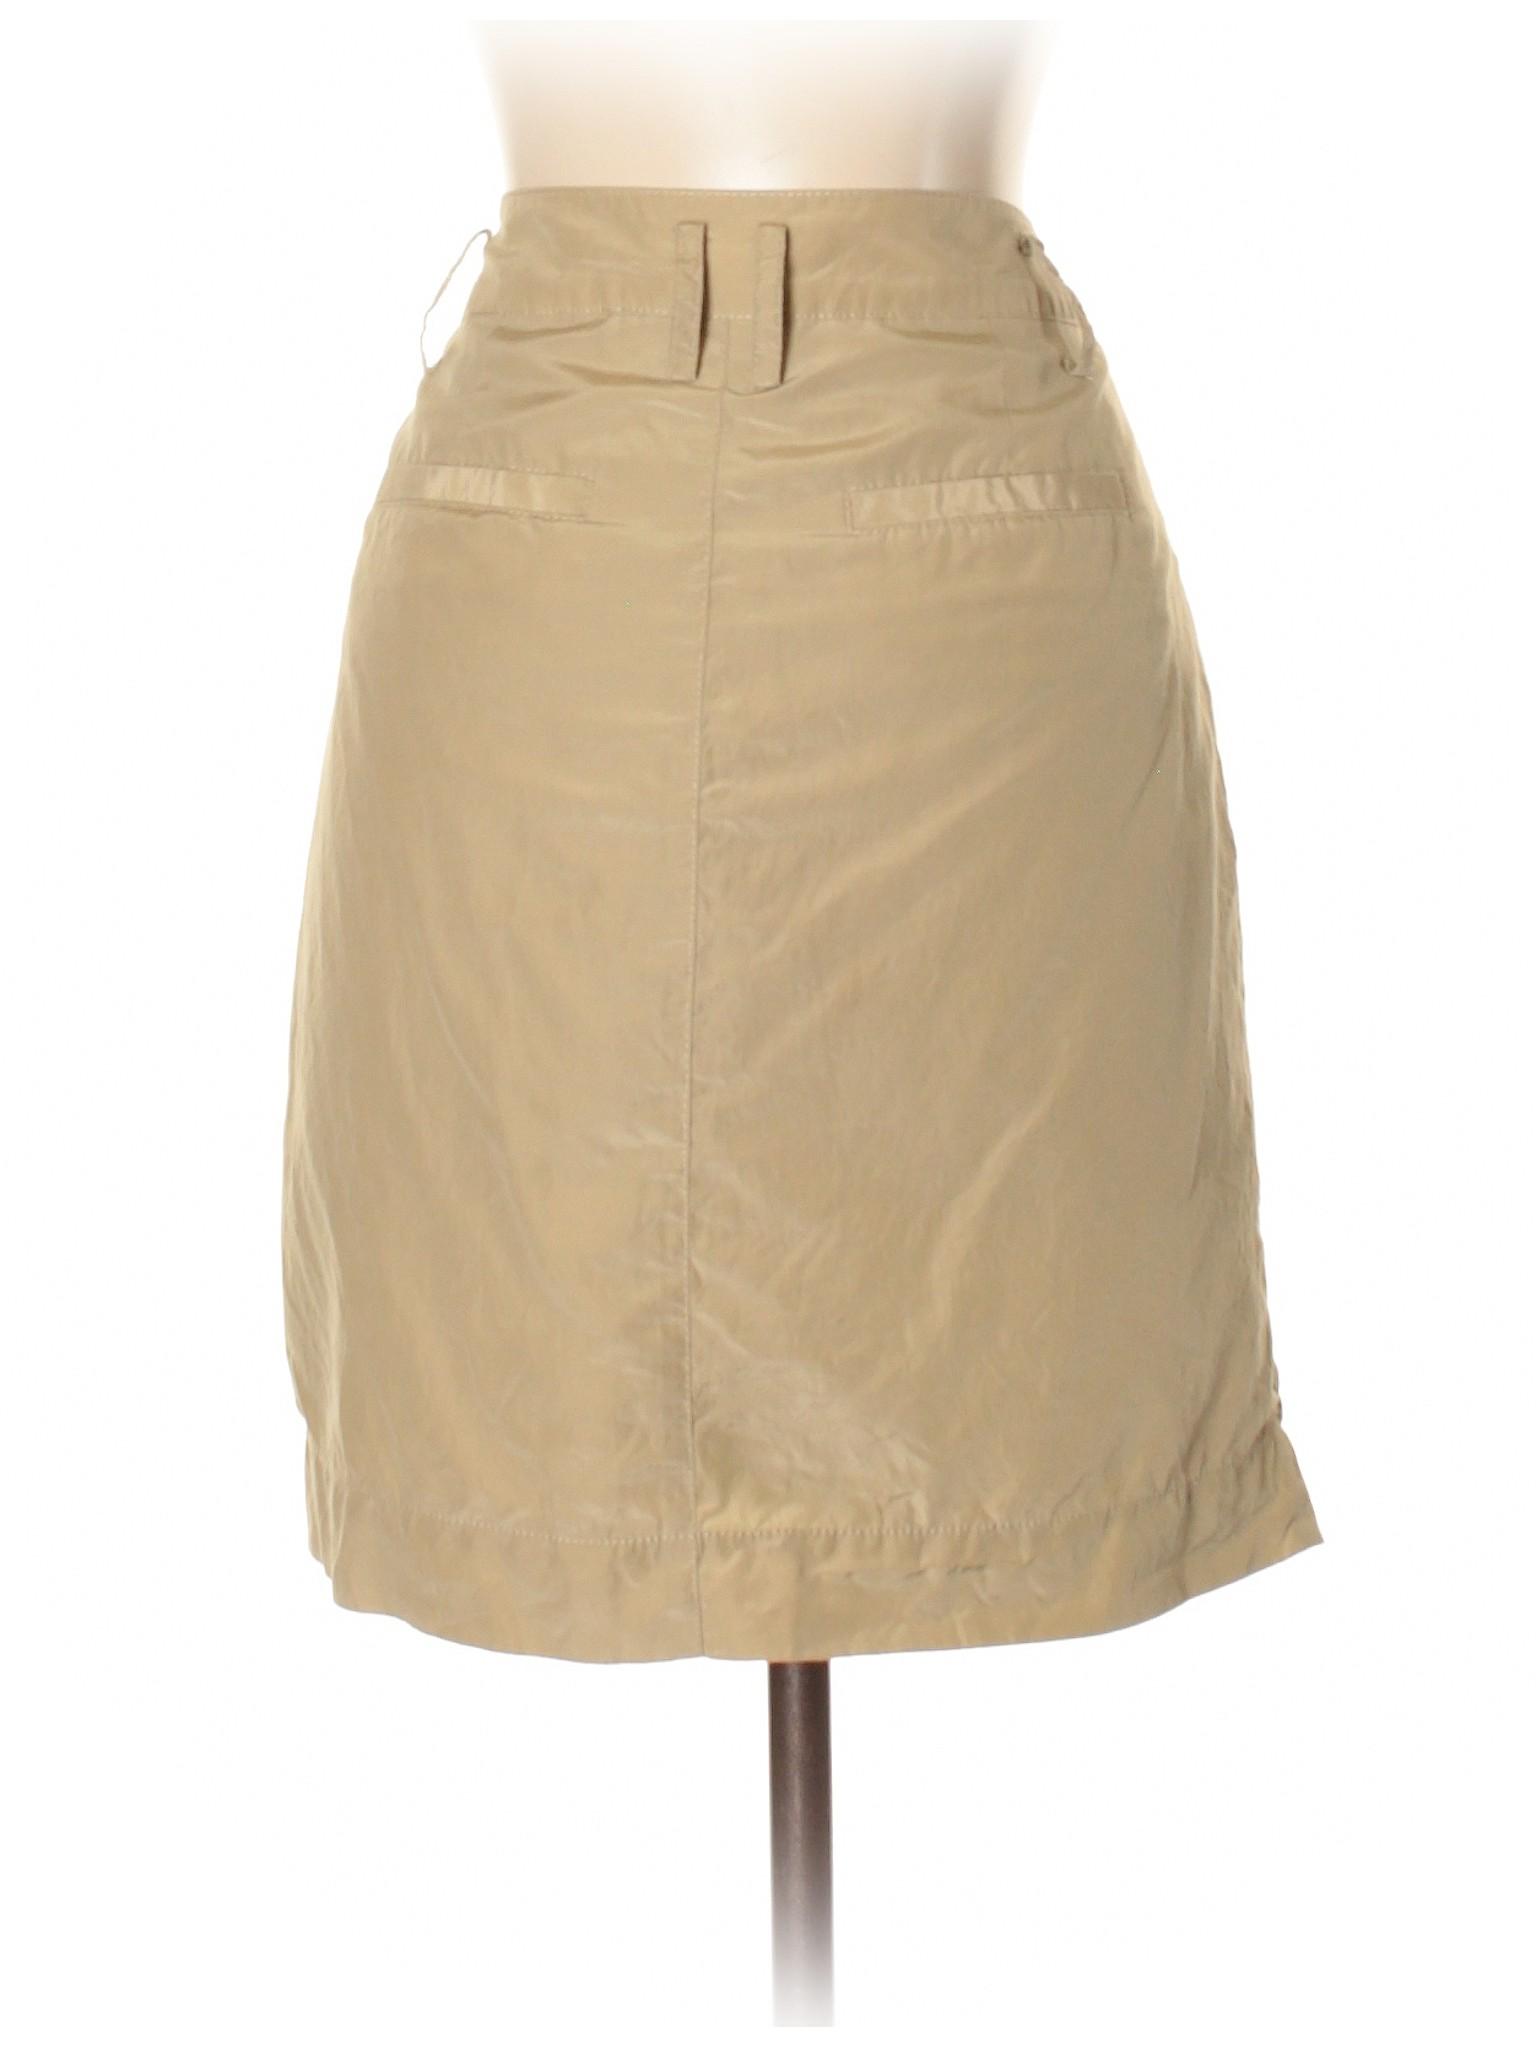 Boutique Skirt Republic Silk Banana leisure UrUqWnBOZ